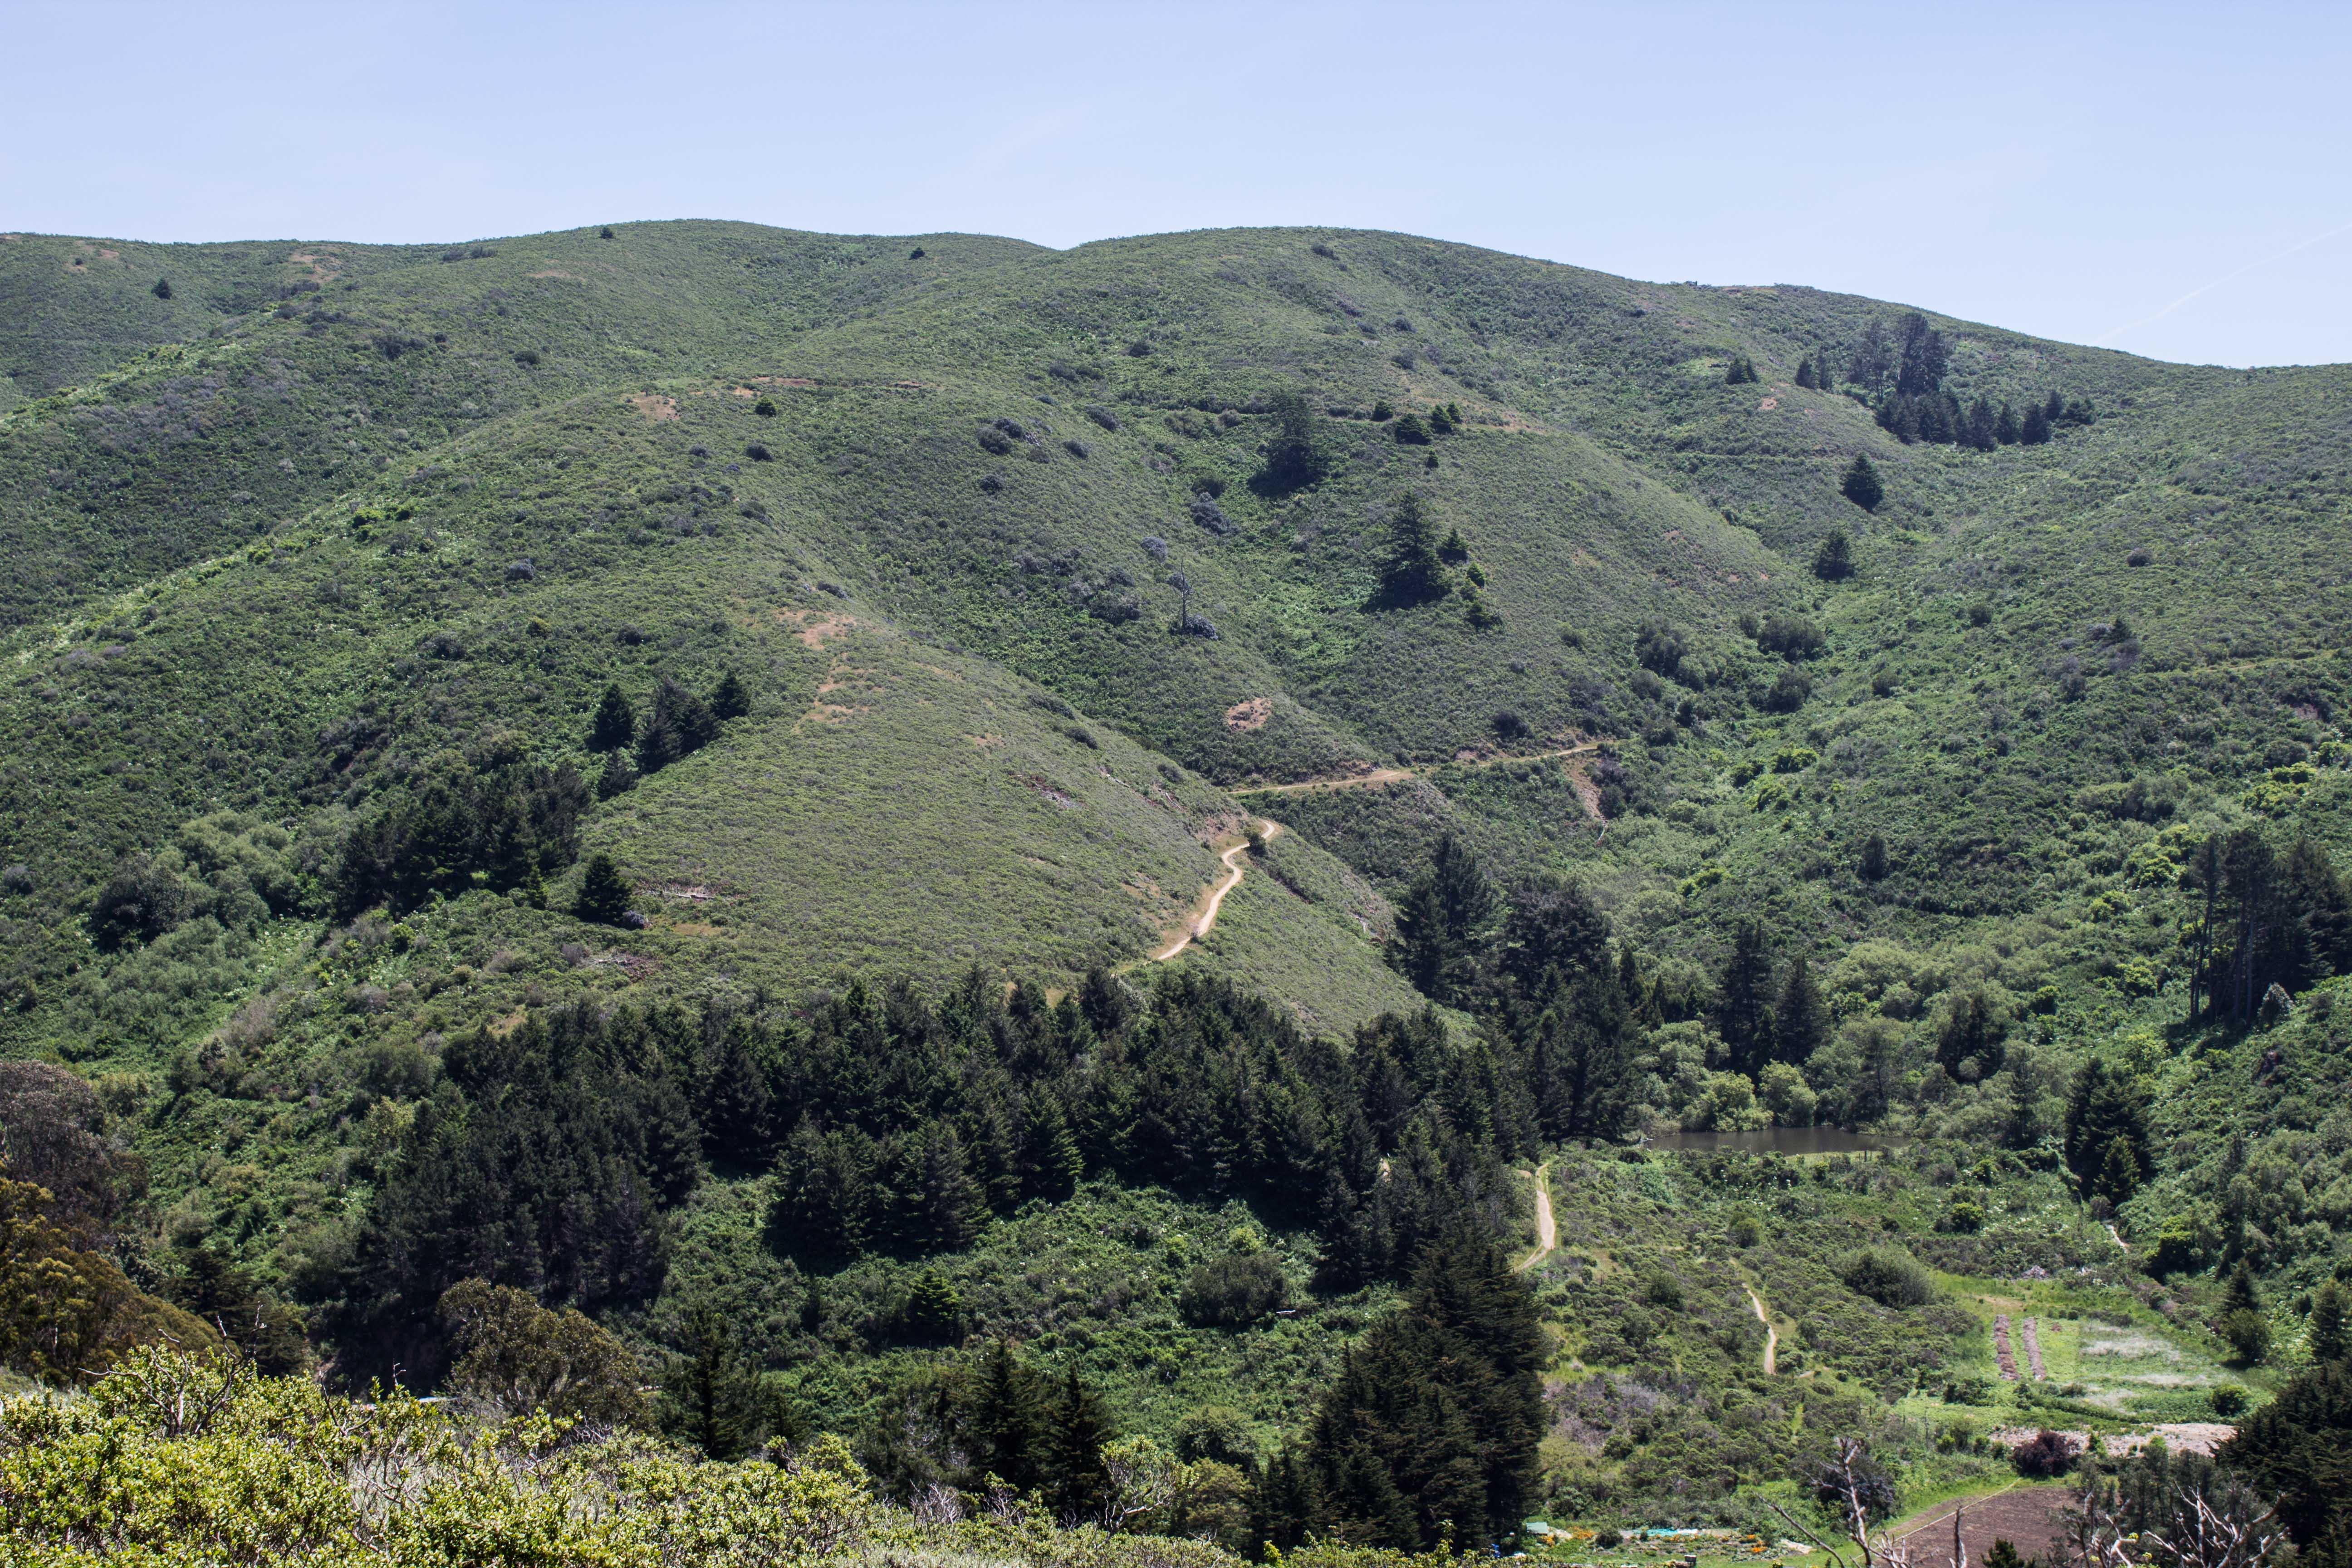 Golden Gate National Recreation Area. Dawn Page/Coastside Slacking